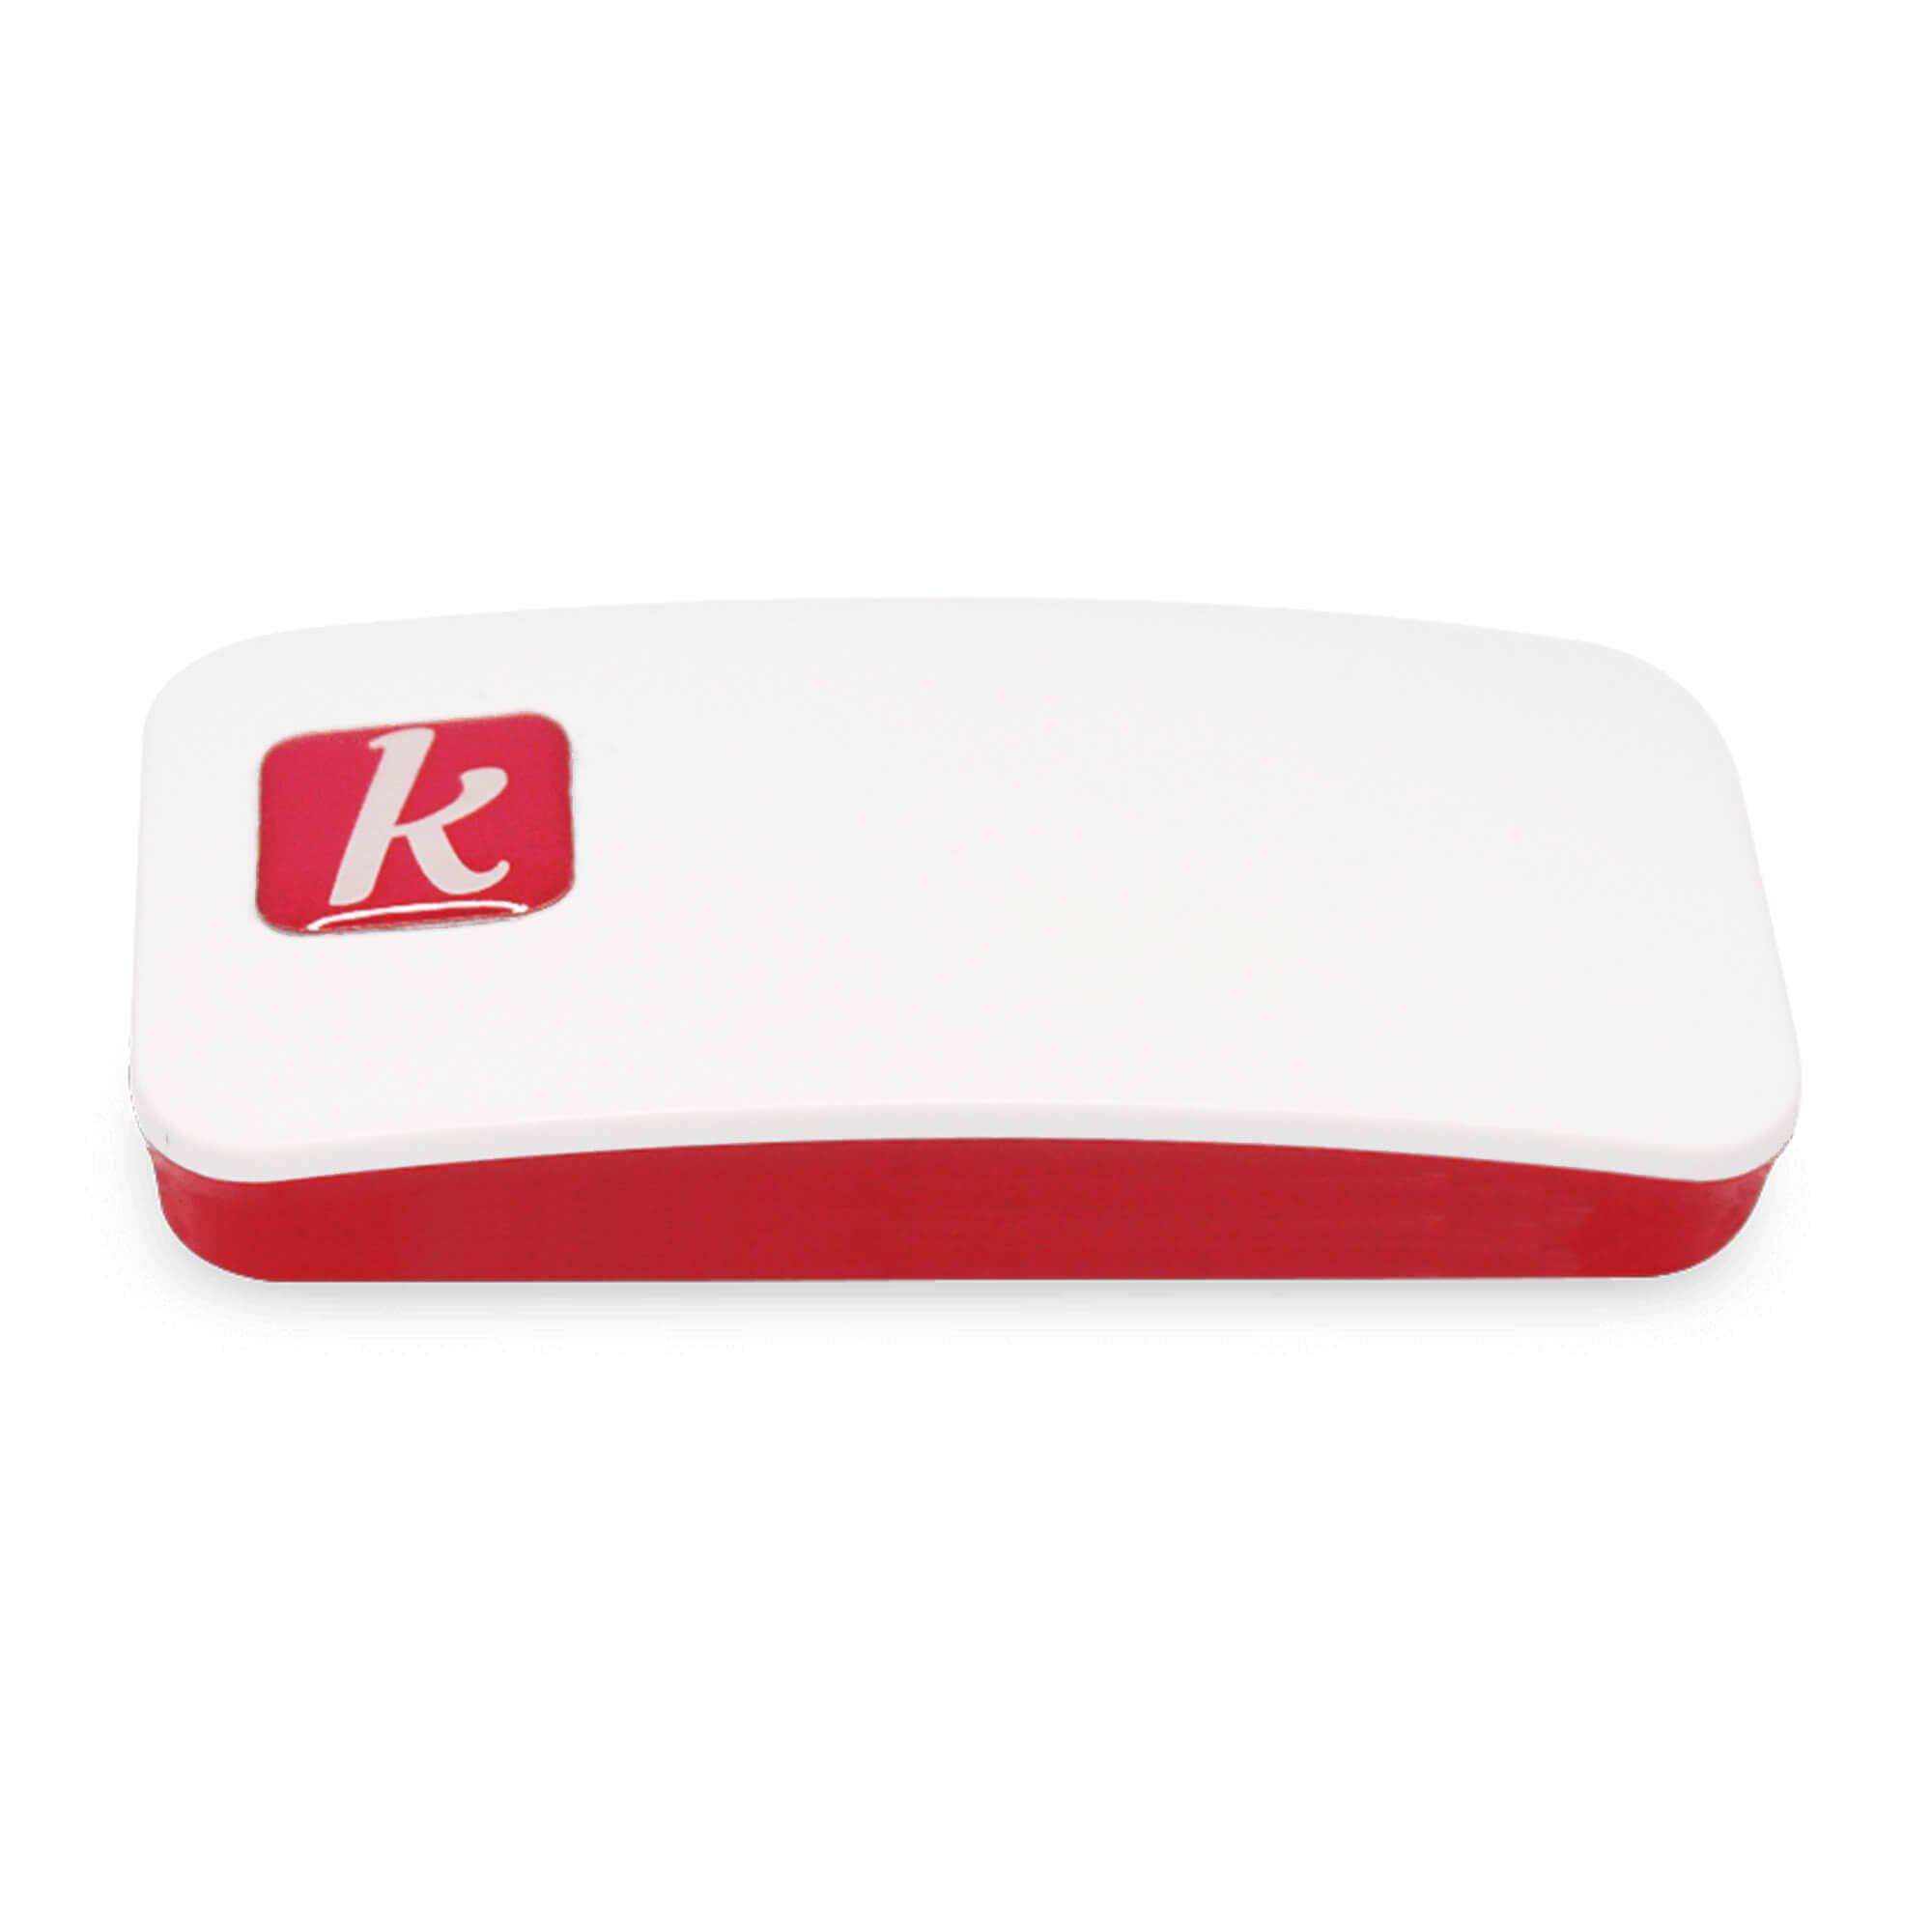 Kwilt Shoebox - iPhone Wireless Storage Expansion - Kwilt Shoebox - Android Wireless Storage Expansion Access from Anywhere.